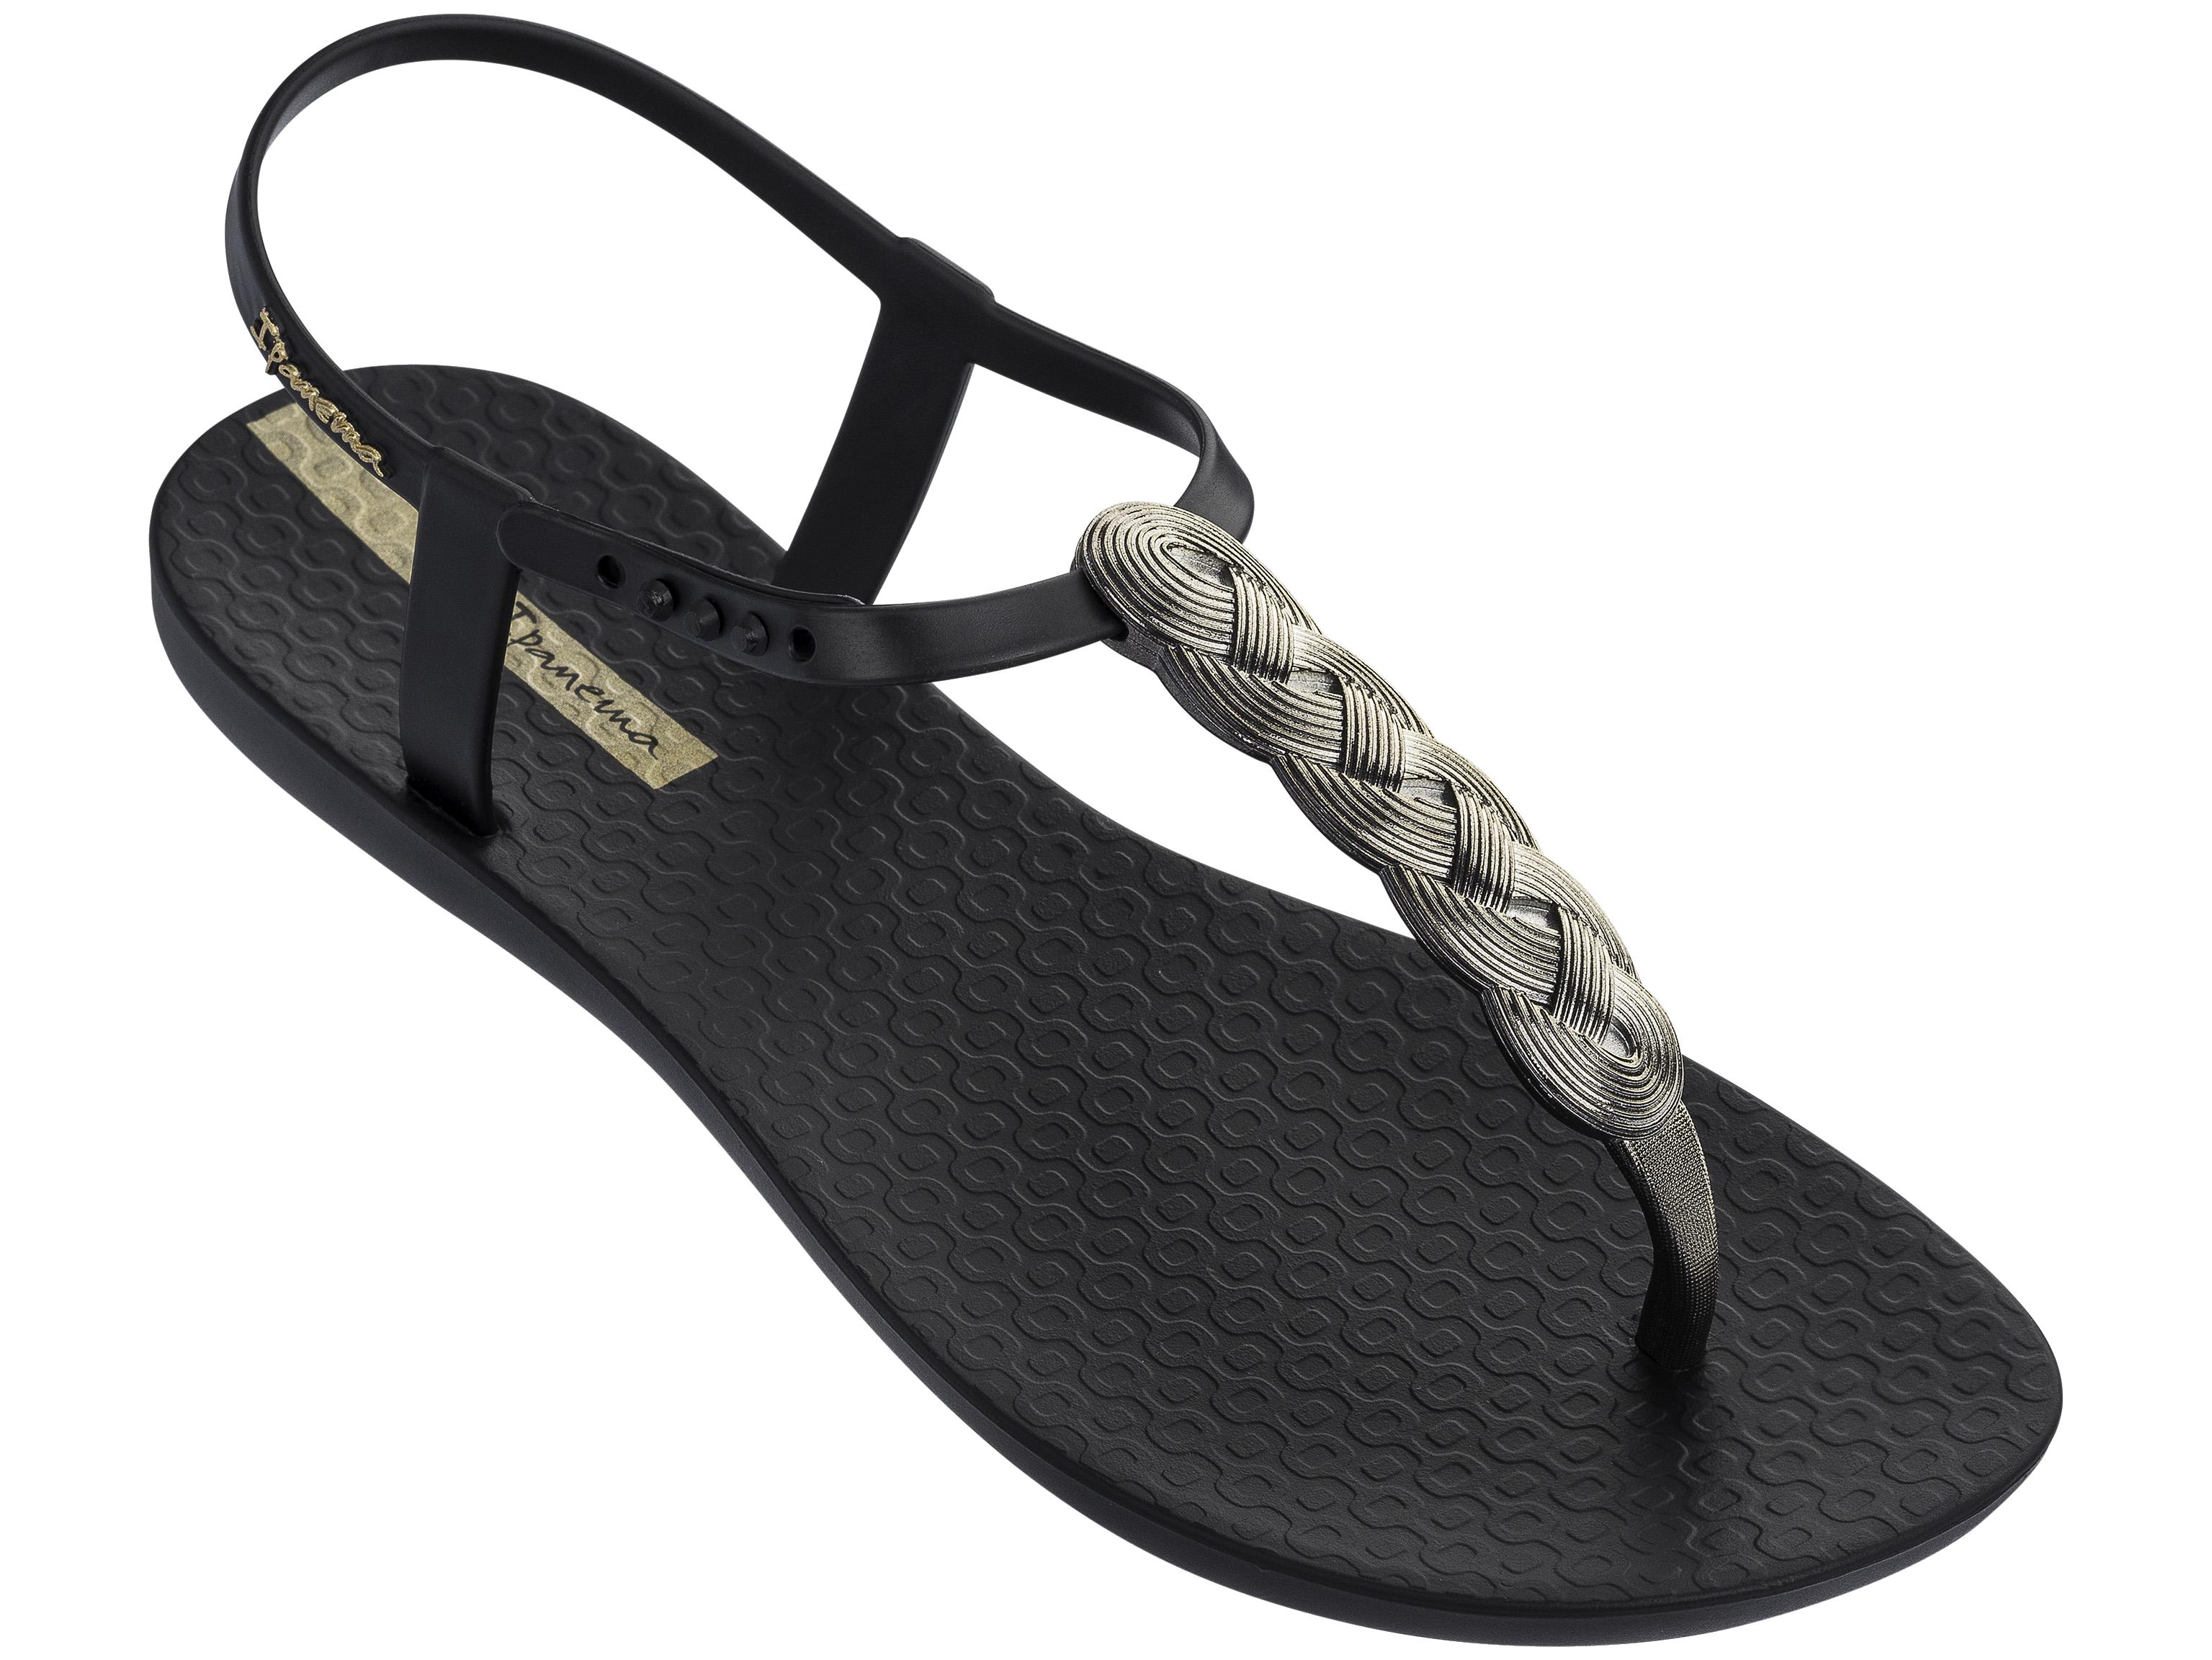 Ipanema Charm VI Sand Fem Damen Schuhe Sandale Zehentrenner 82517 Schwarz 9139